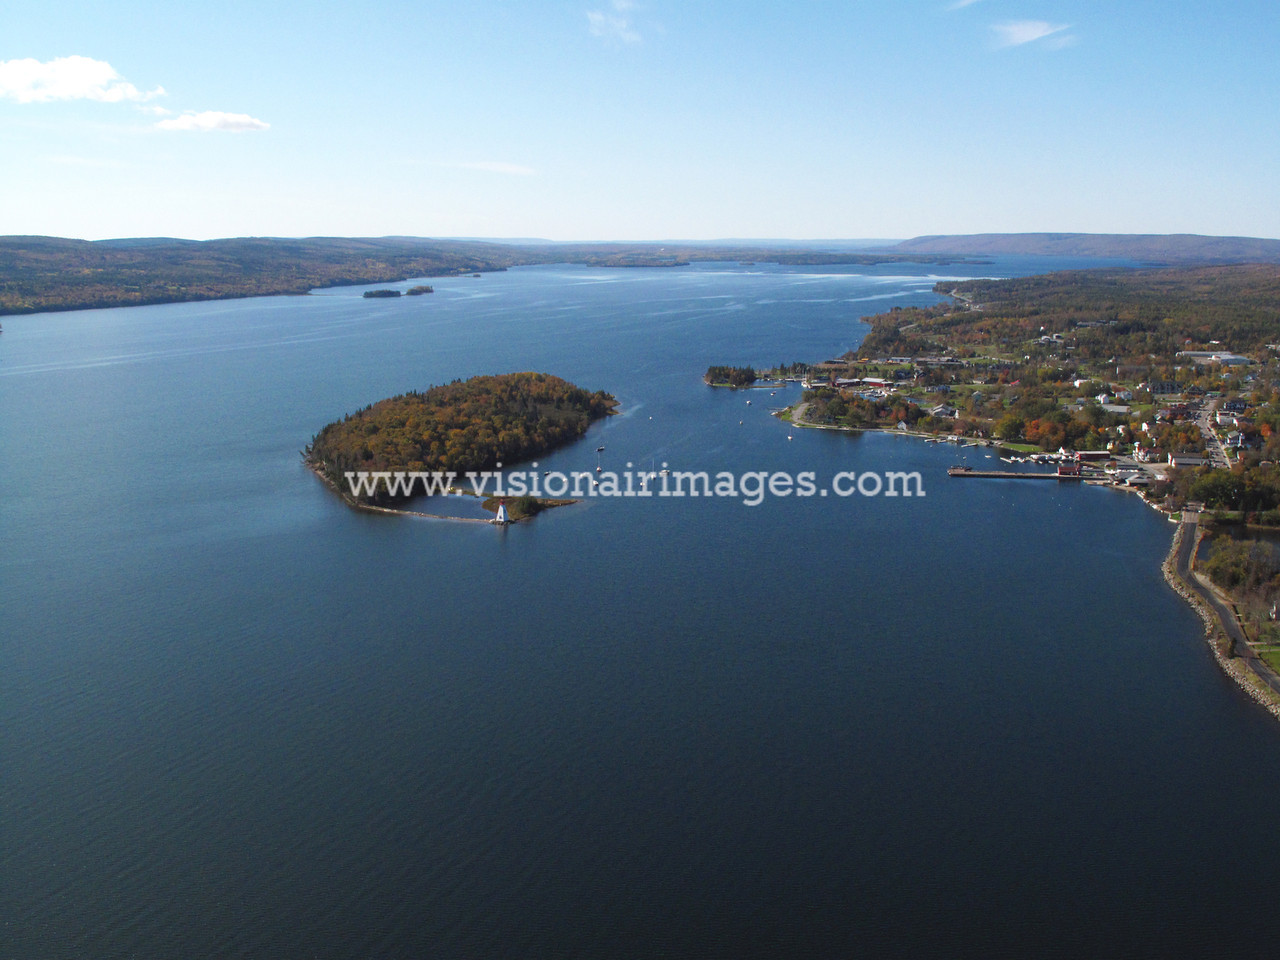 Baddeck Townsite Aerial, Wagmatcook First Nation, Cape Breton, Nova Scotia, Canada